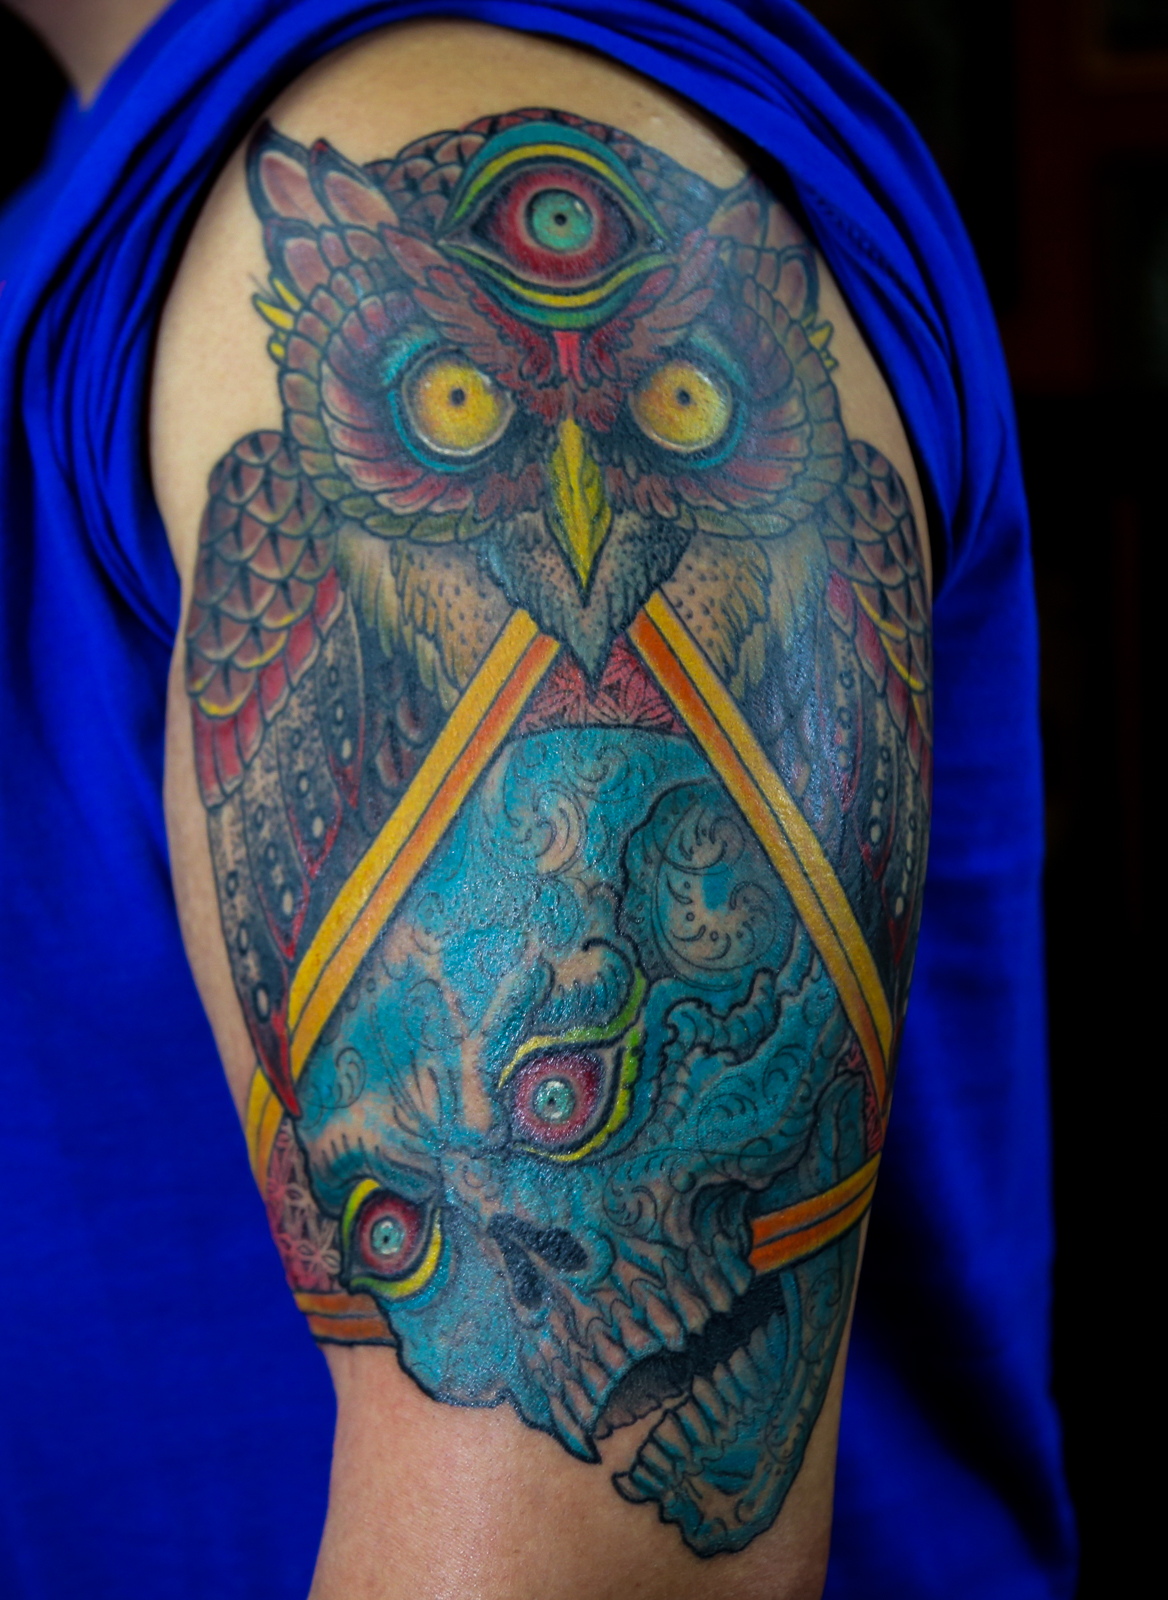 Owl and Skull enrique bernal ejay tattoo.jpg